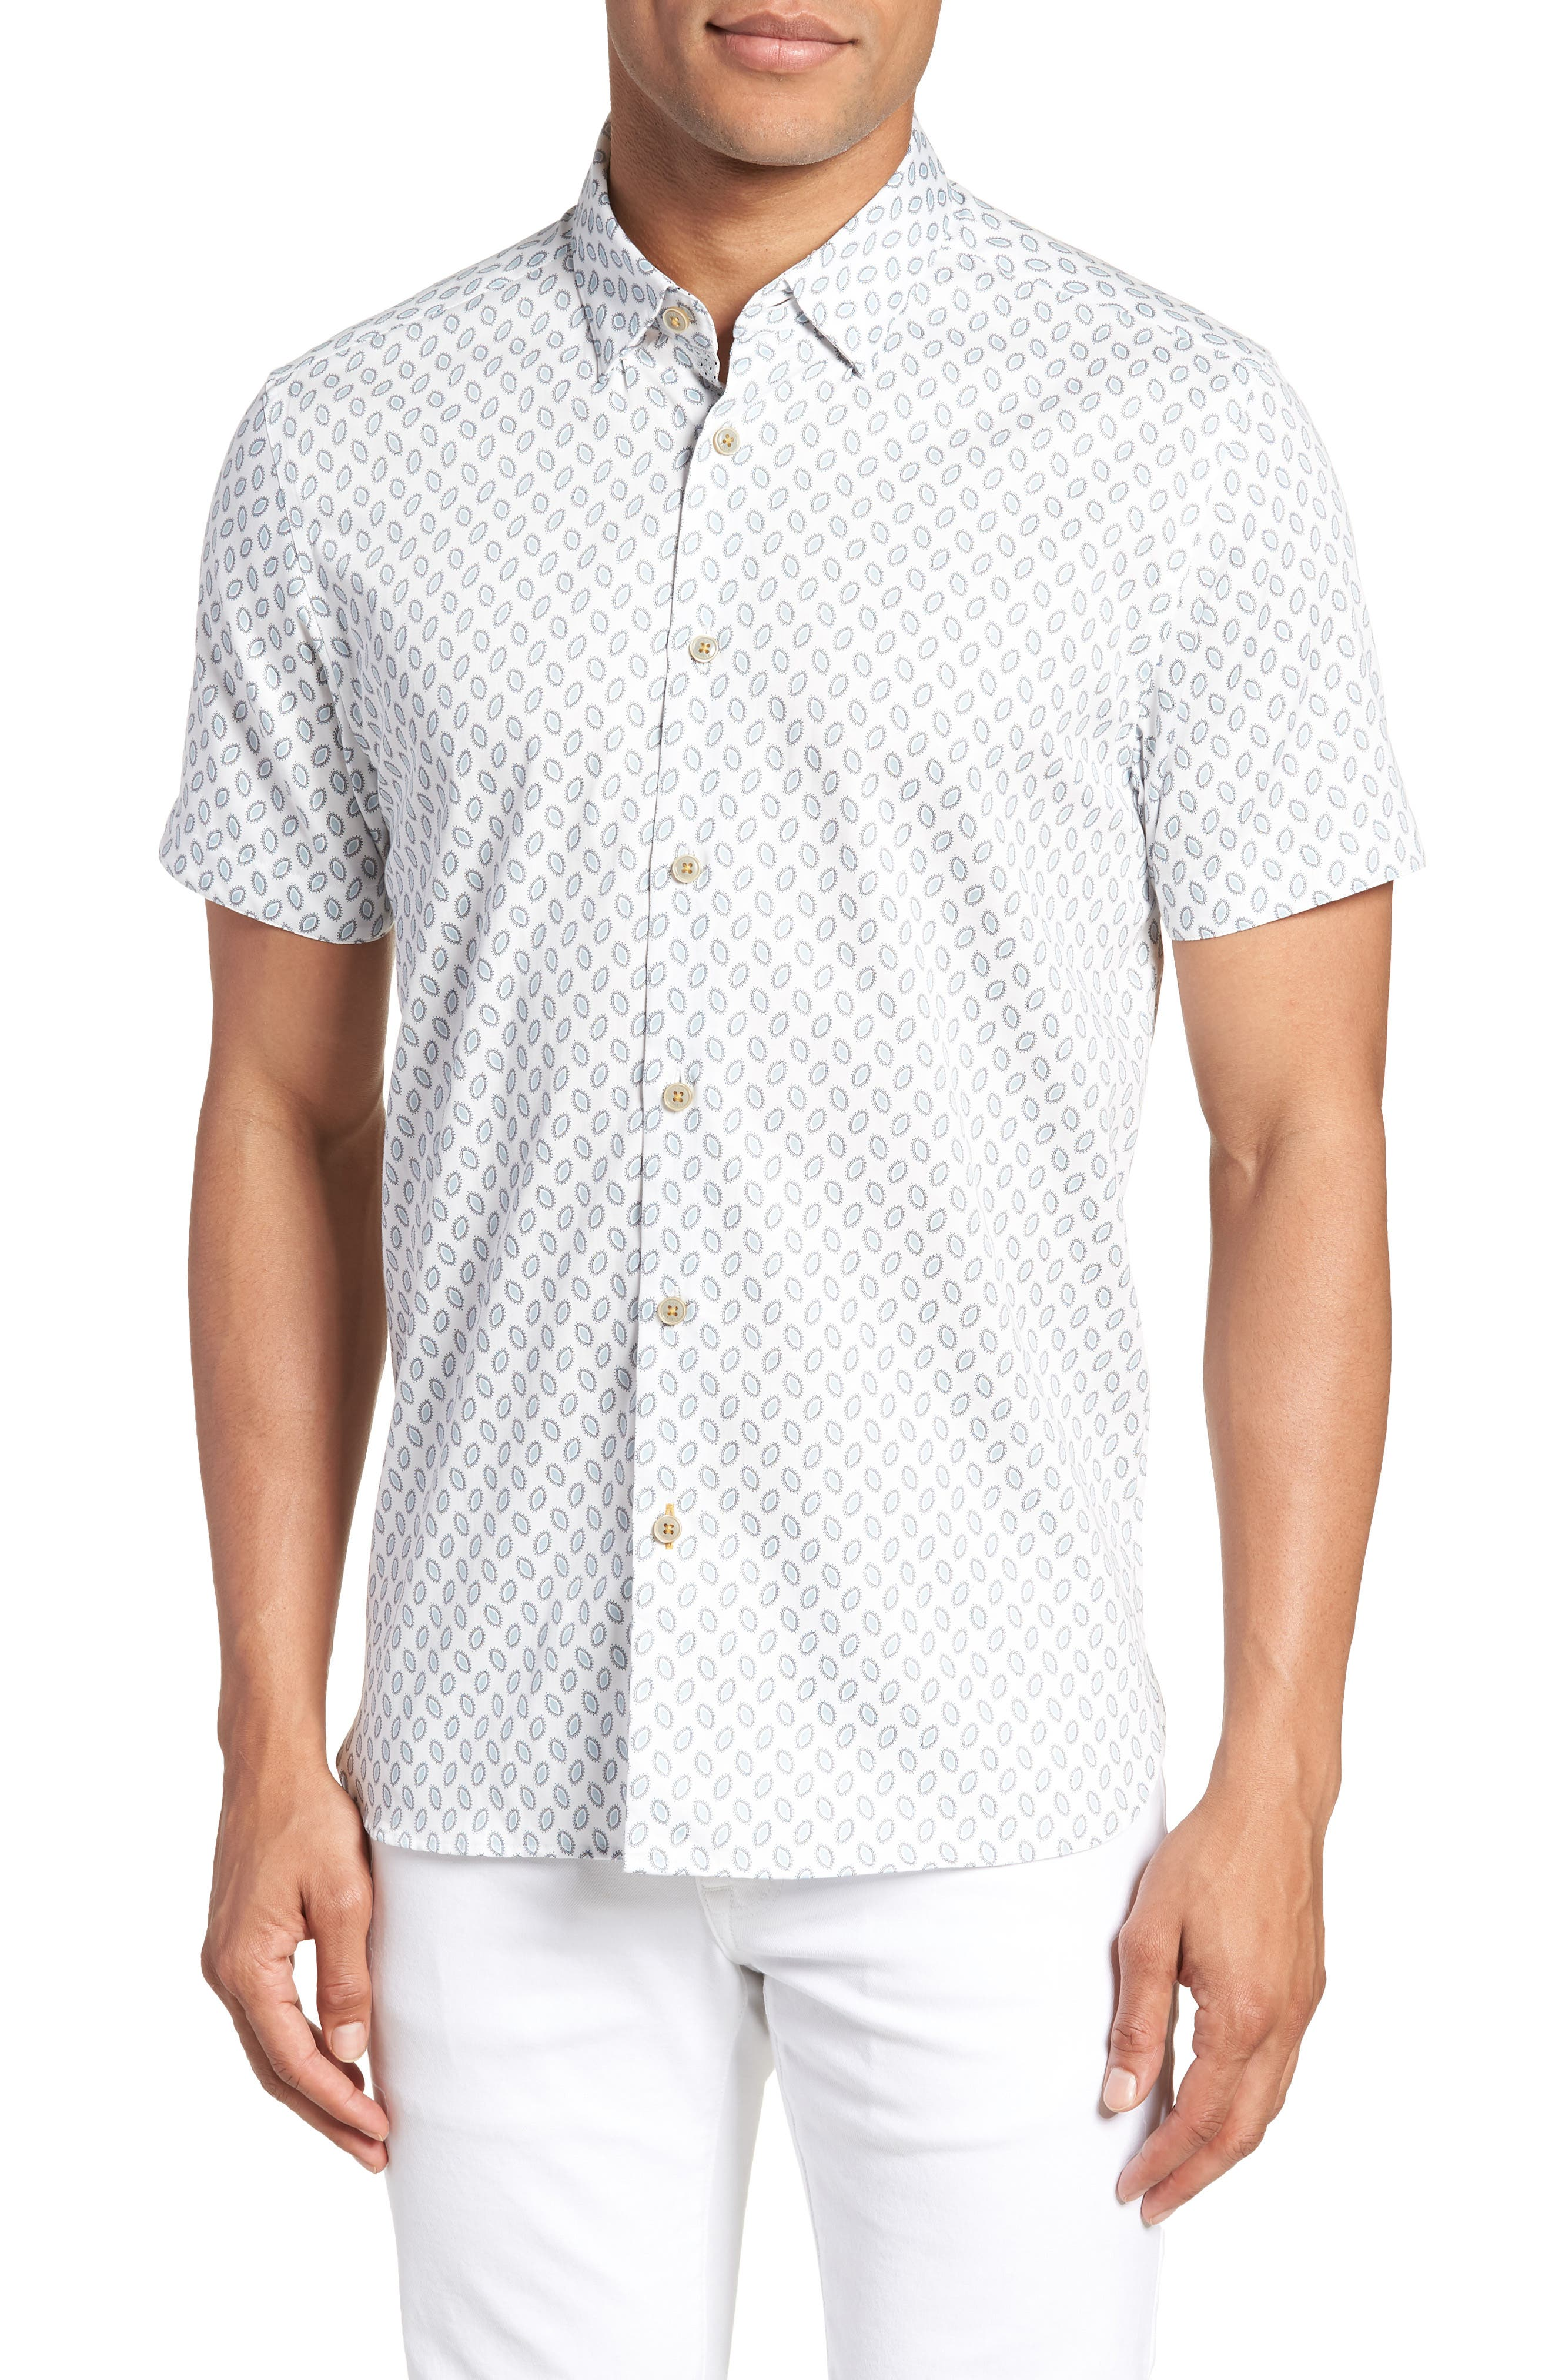 Newfone Trim Fit Chambray Sport Shirt,                             Main thumbnail 1, color,                             White